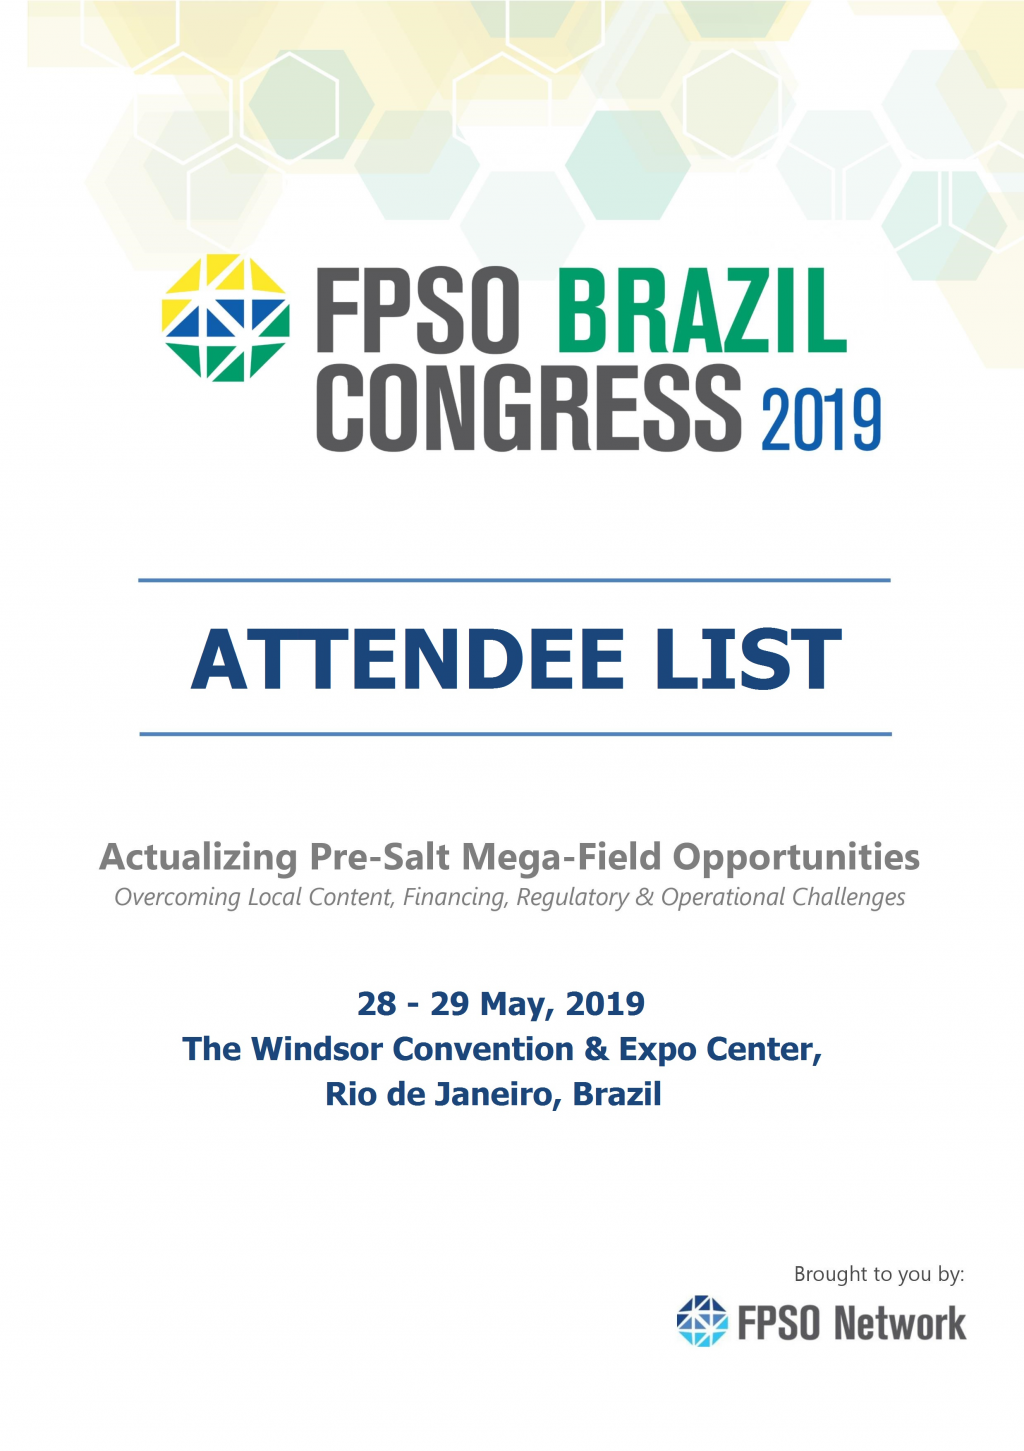 FPSO Brazil Congress 2019 - Attendee List